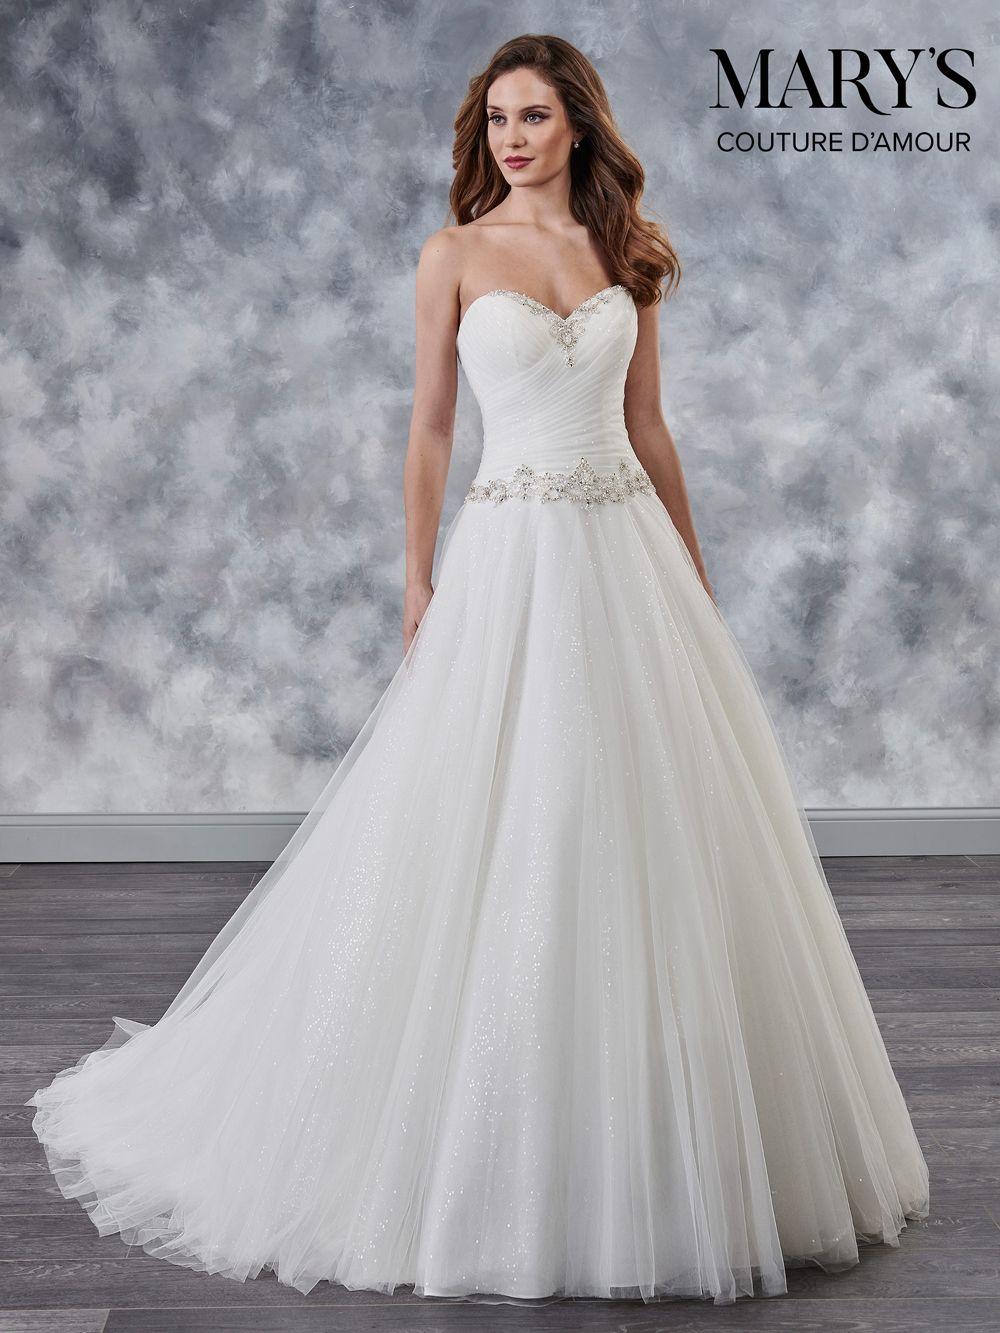 Marys Bridal Mb4028 Strapless Sweetheart Bridal Gown Sweetheart Wedding Dress Drop Waist Wedding Dress Wedding Dresses [ 1333 x 1000 Pixel ]